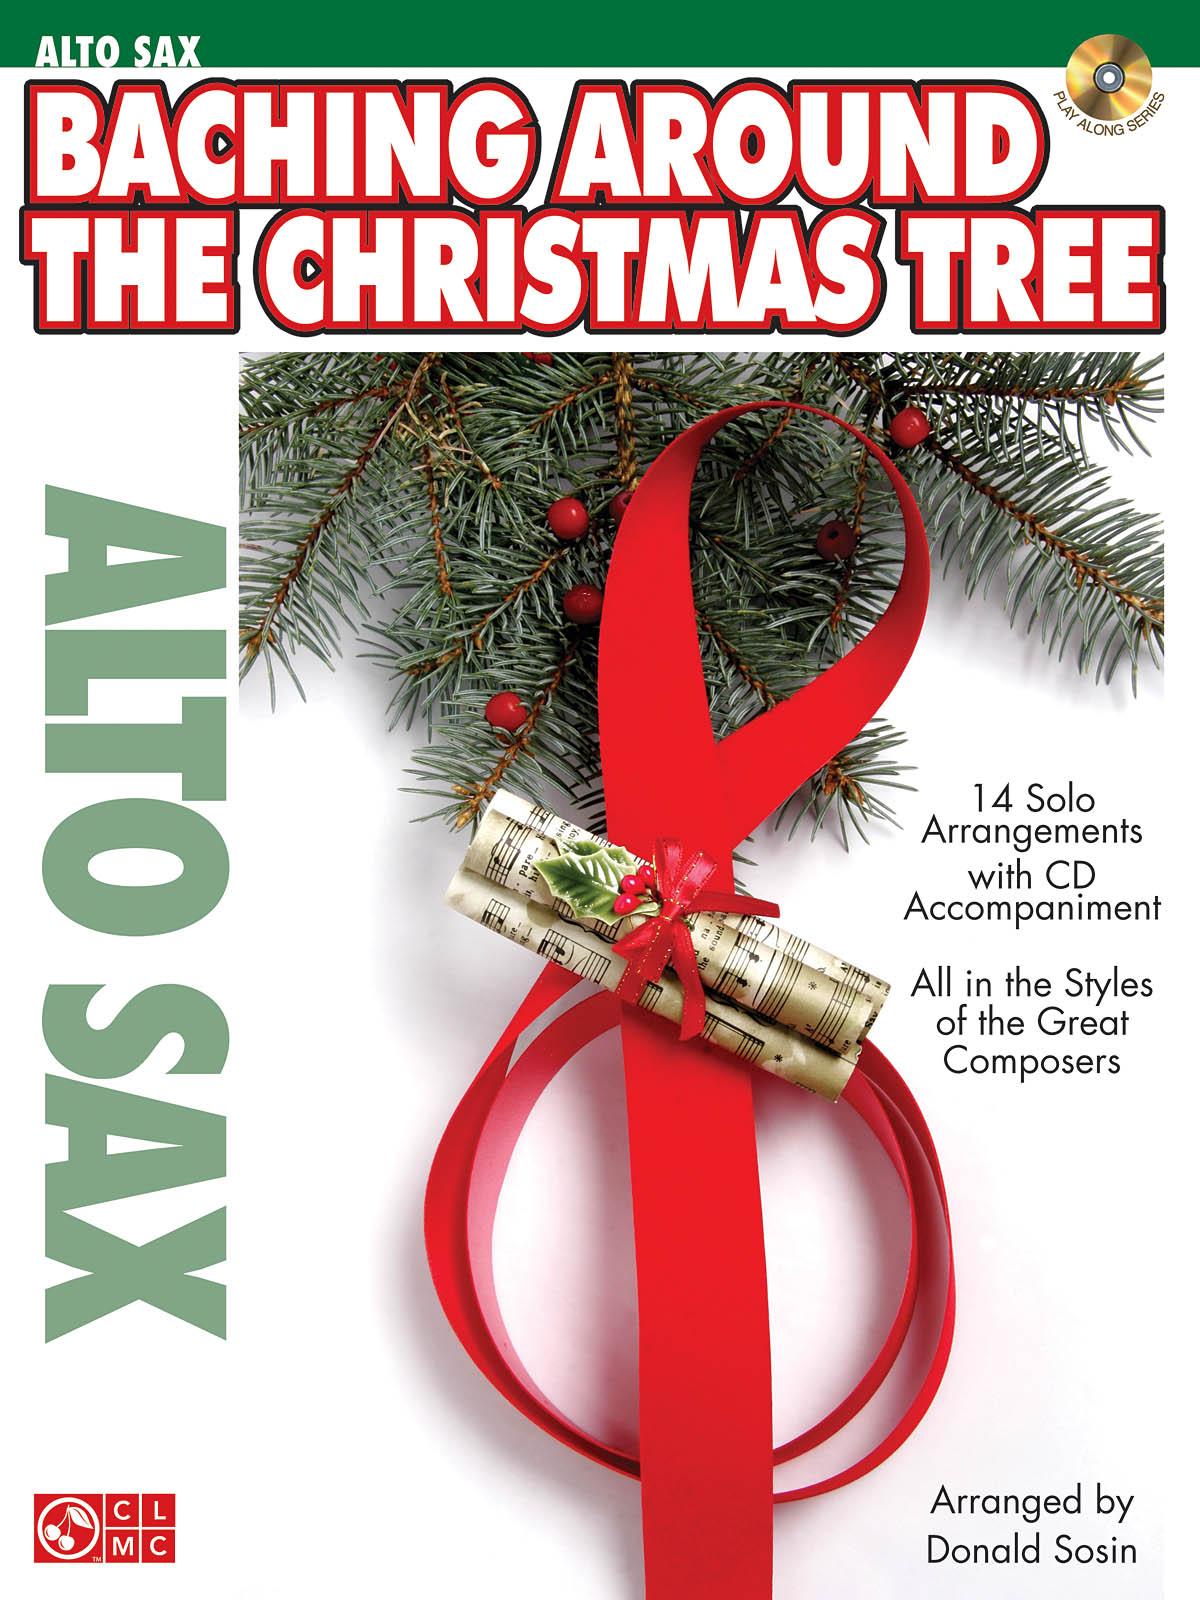 Baching Around the Christmas Tree - Alto Sax: Alto Saxophone: Backing Tracks